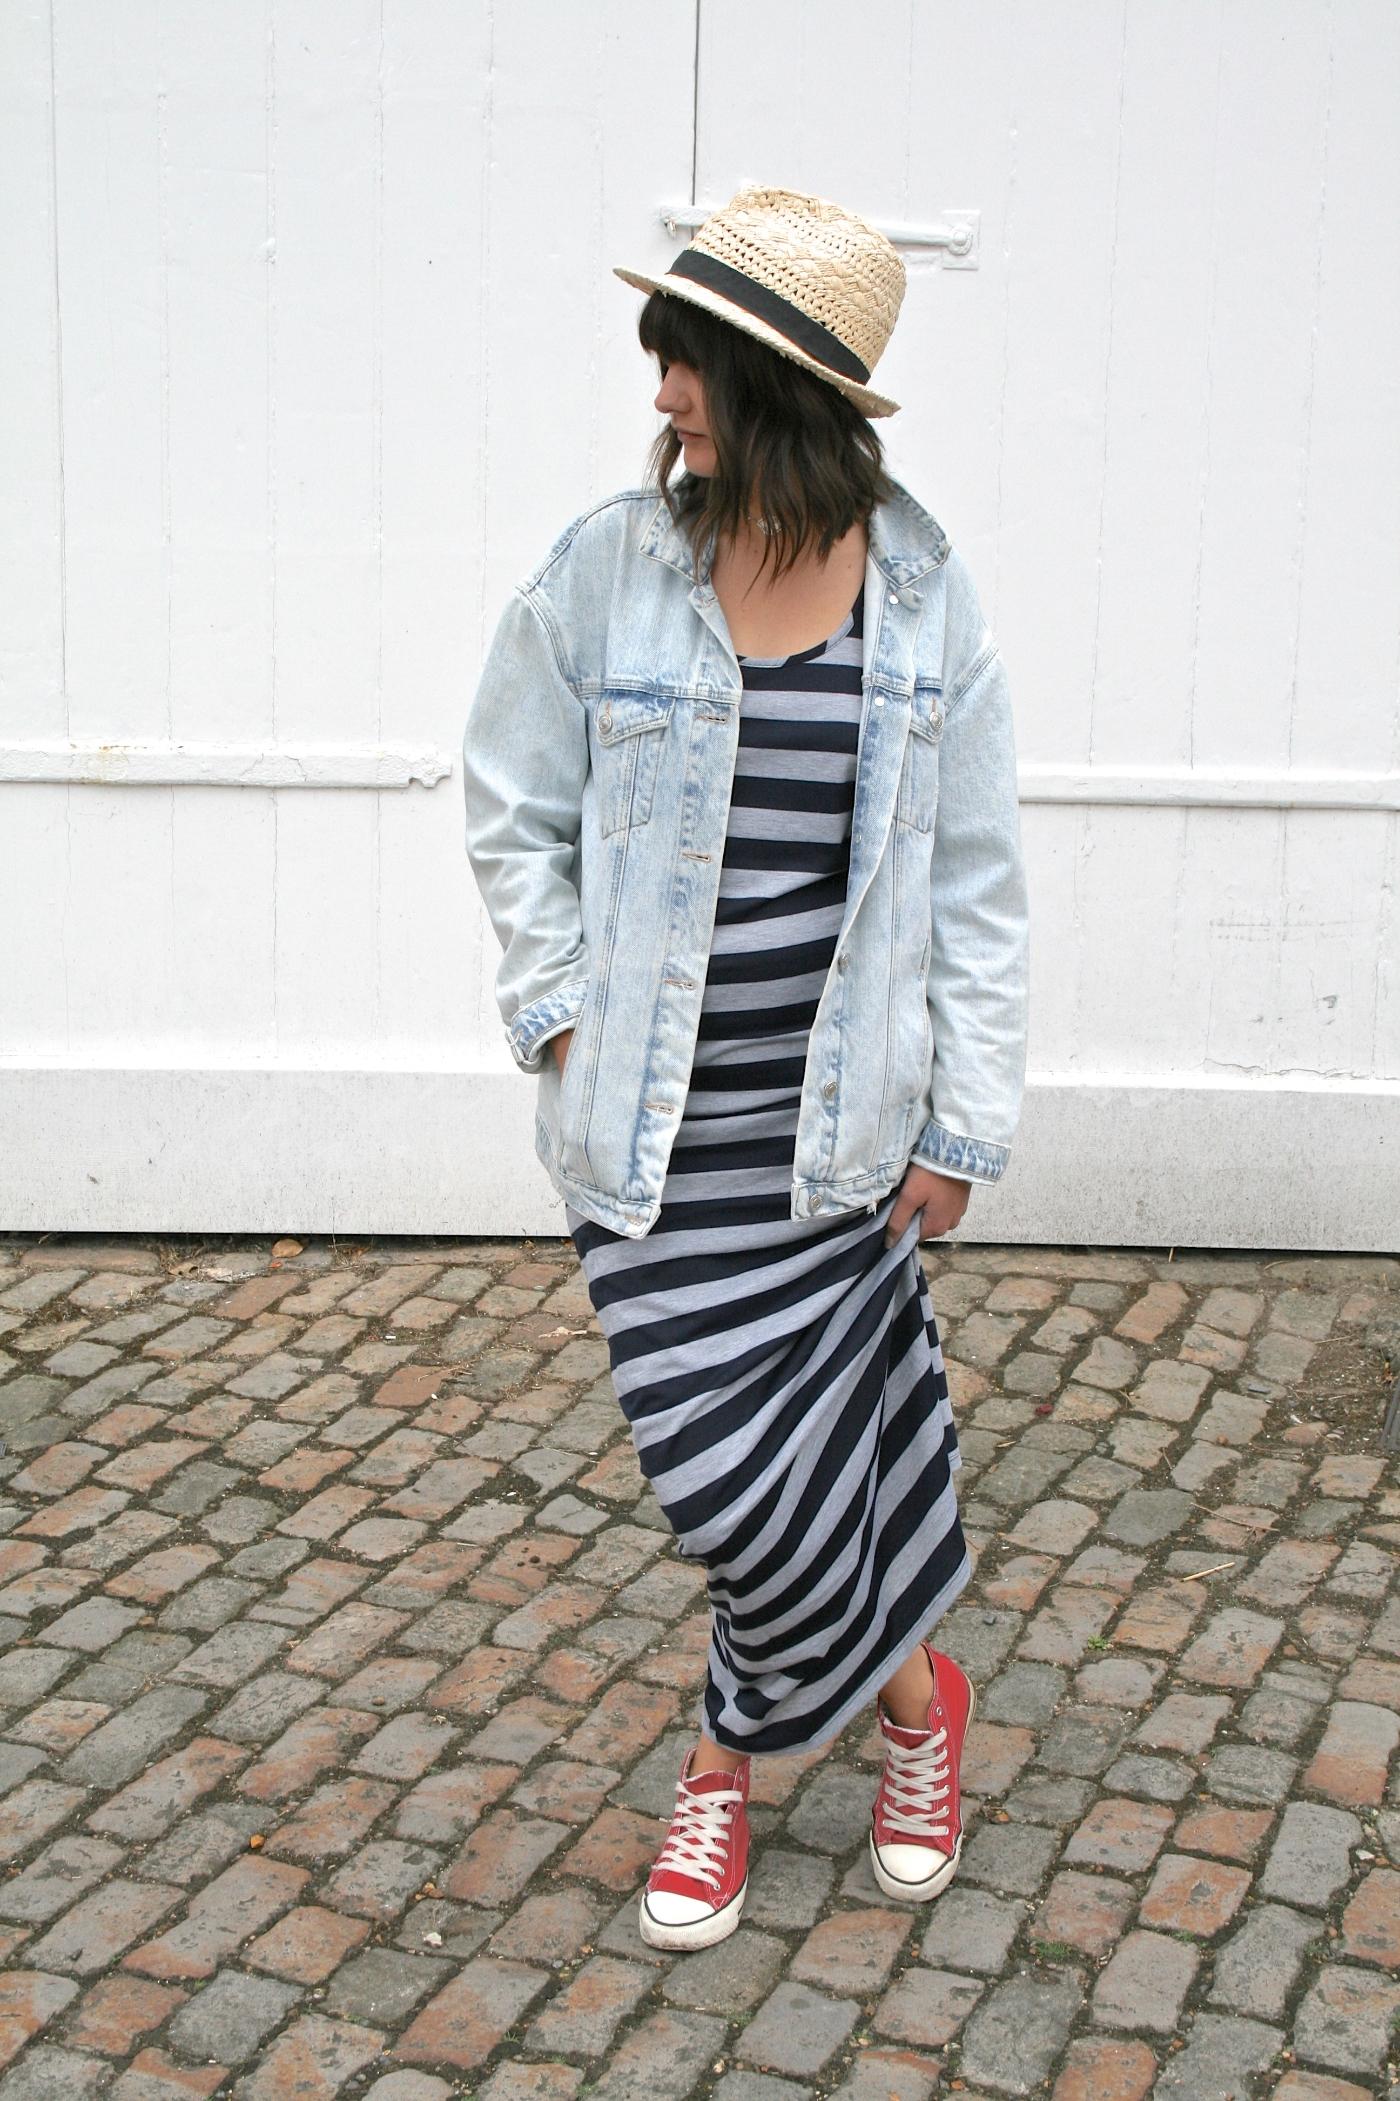 denim jacket, stripy maxi dress, red converse